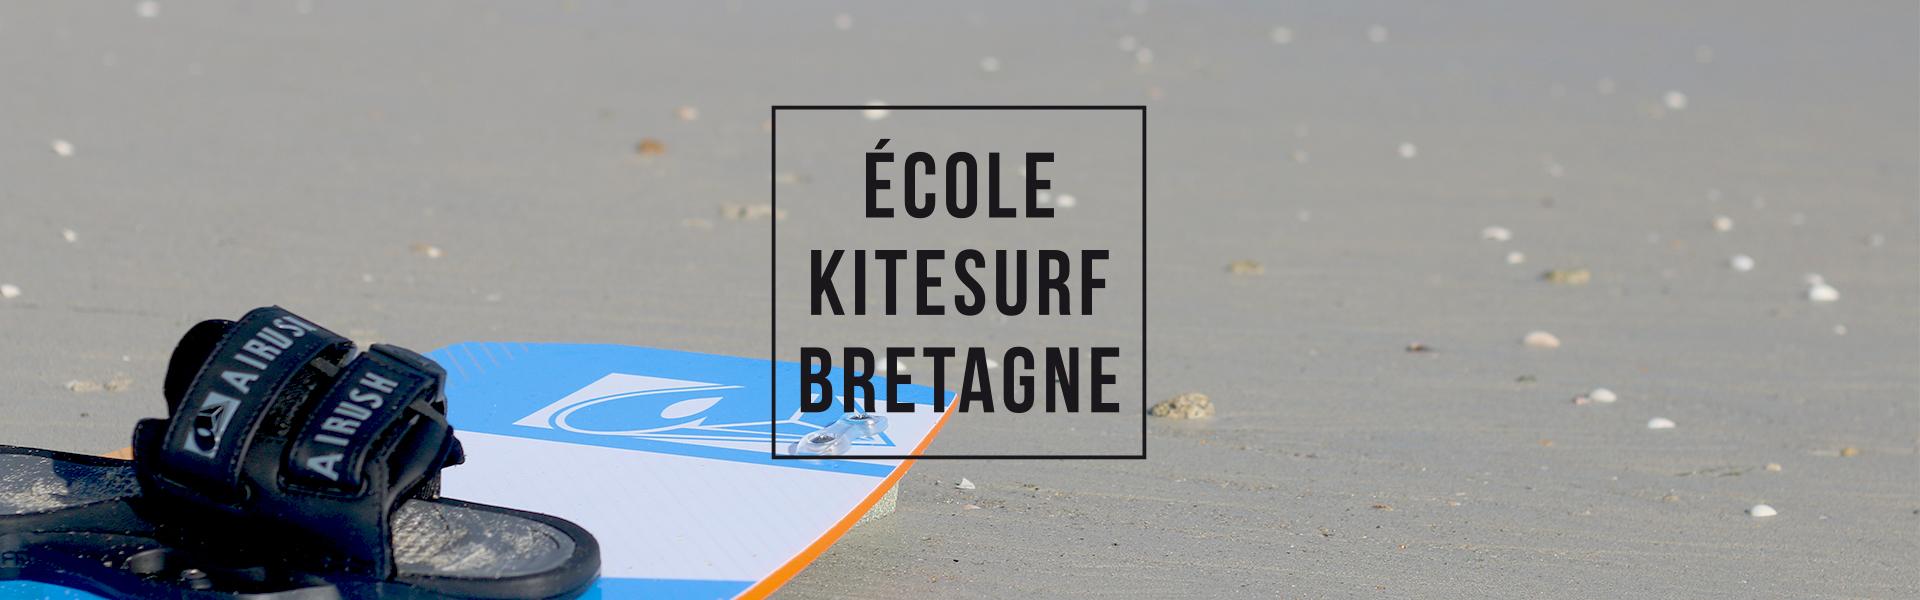 Ecole Kitesurf Keremma